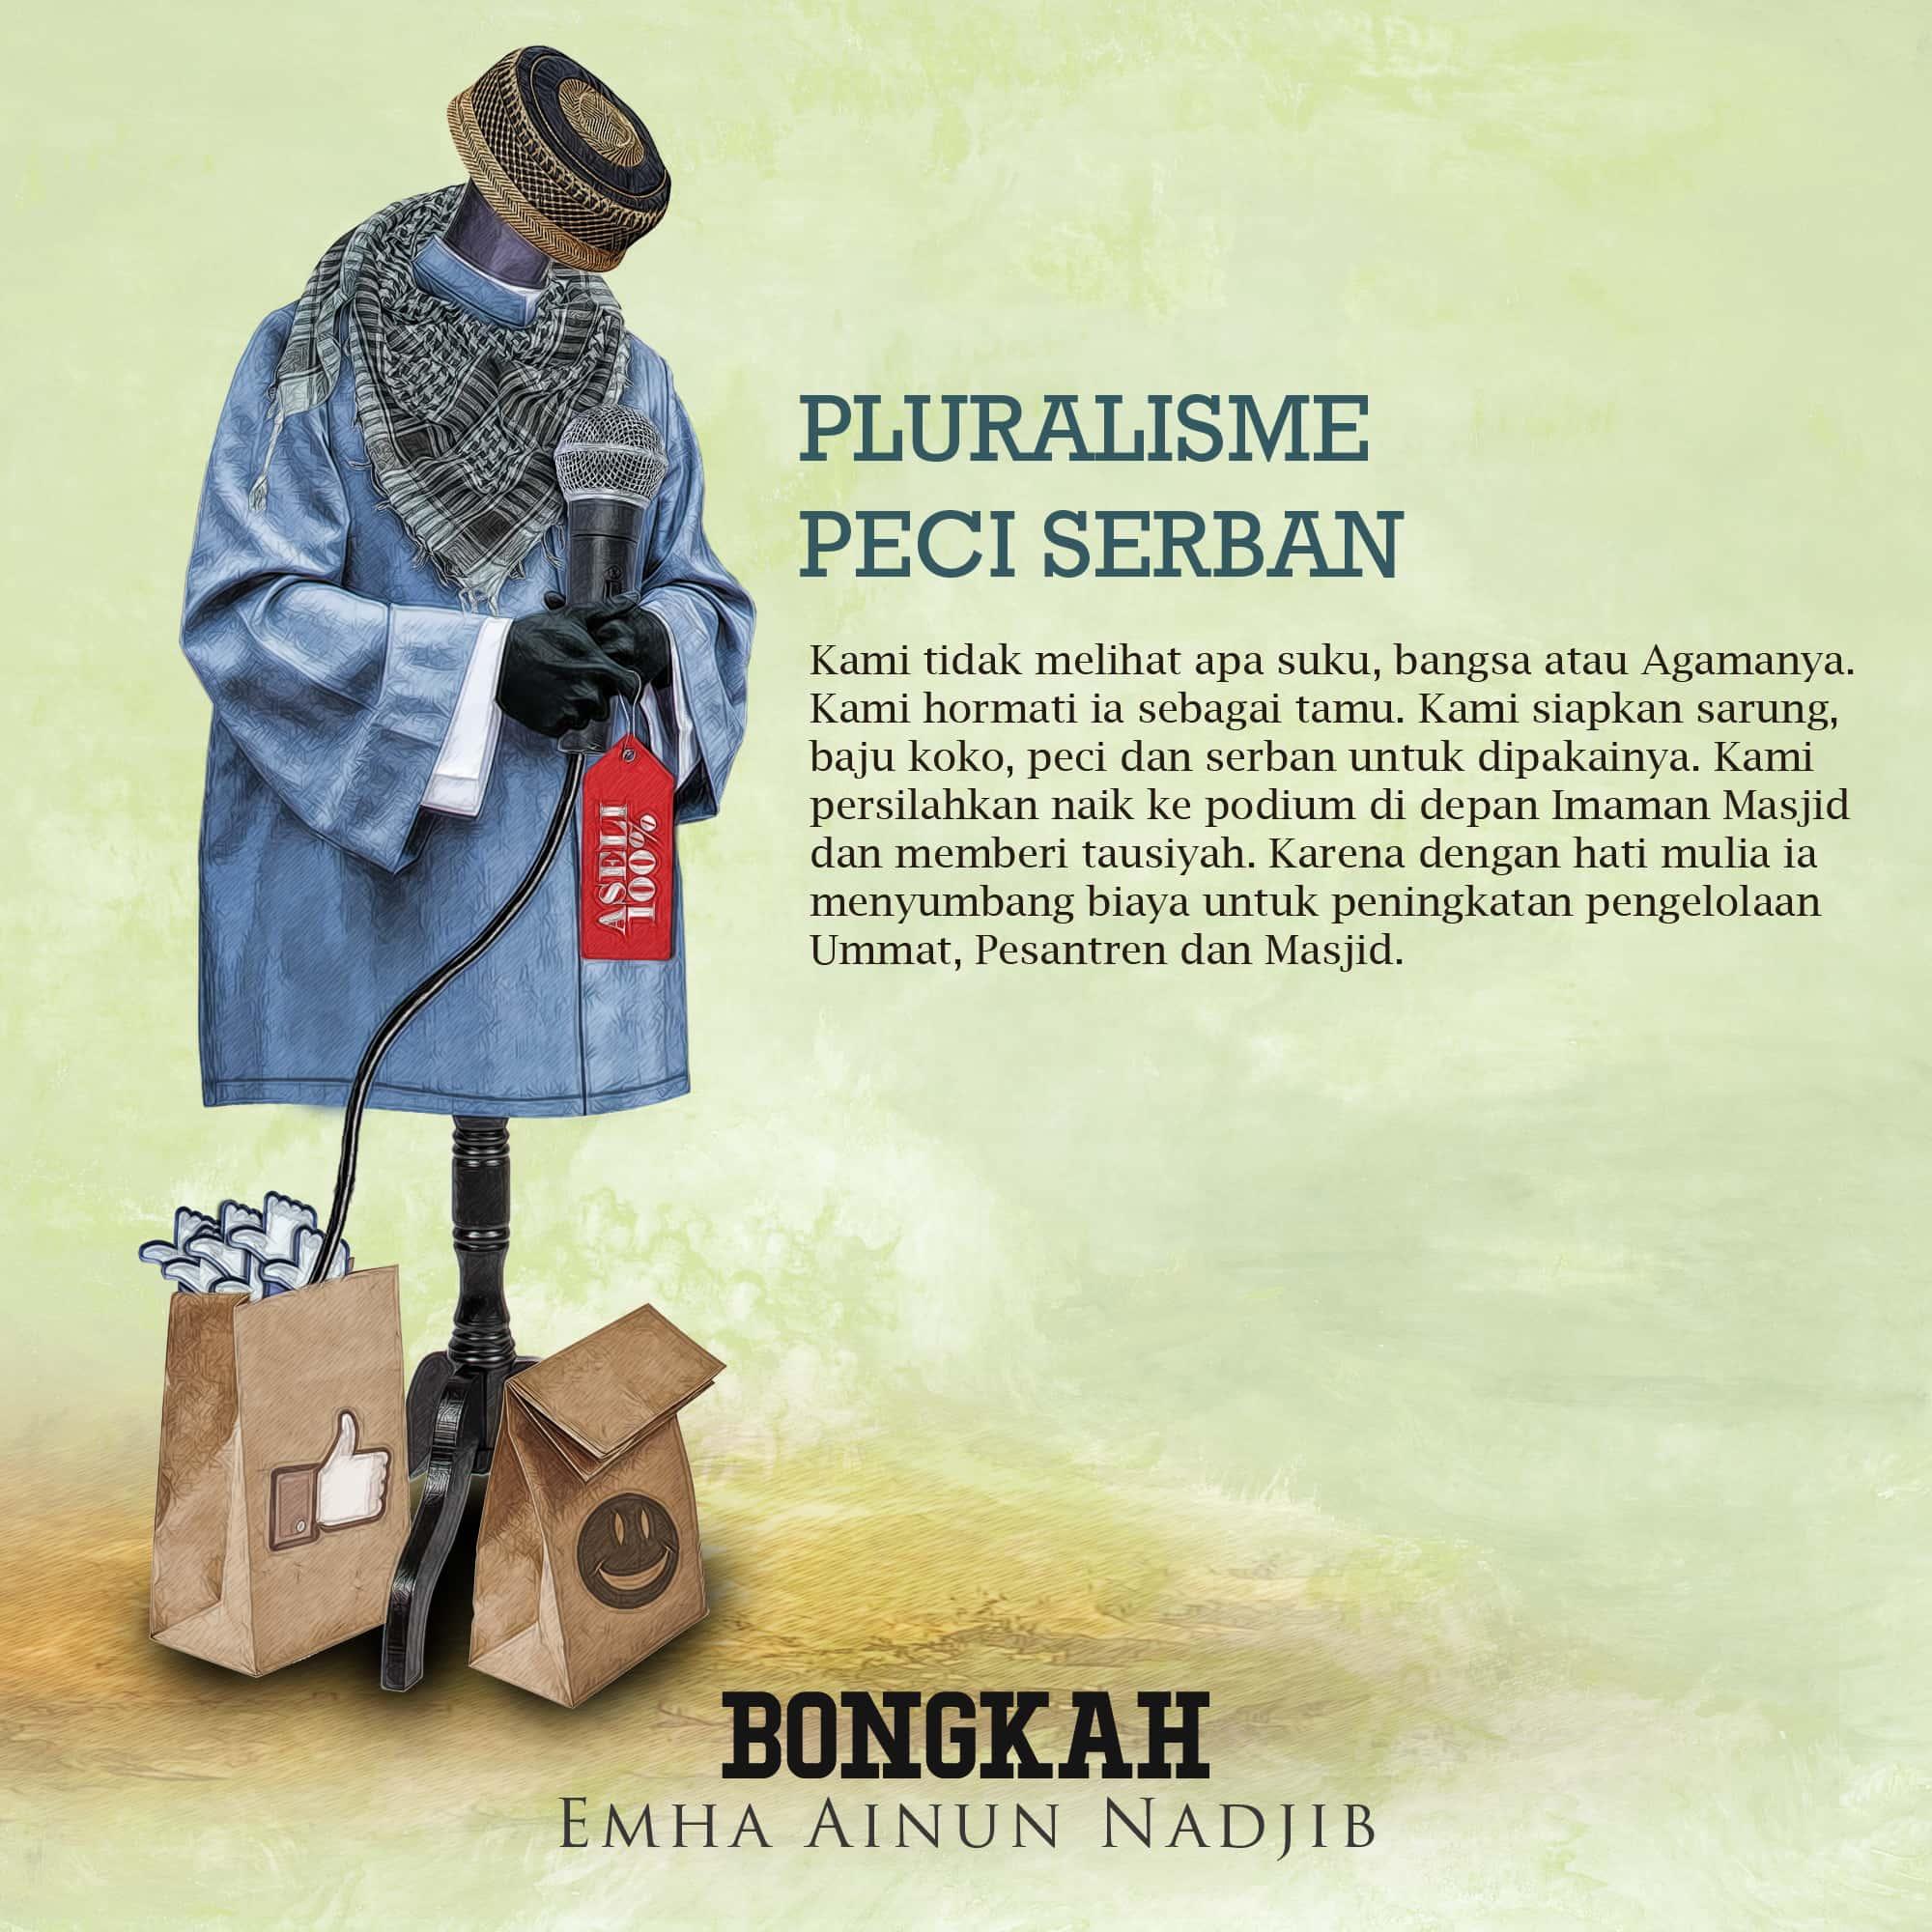 Pluralisme Peci Serban